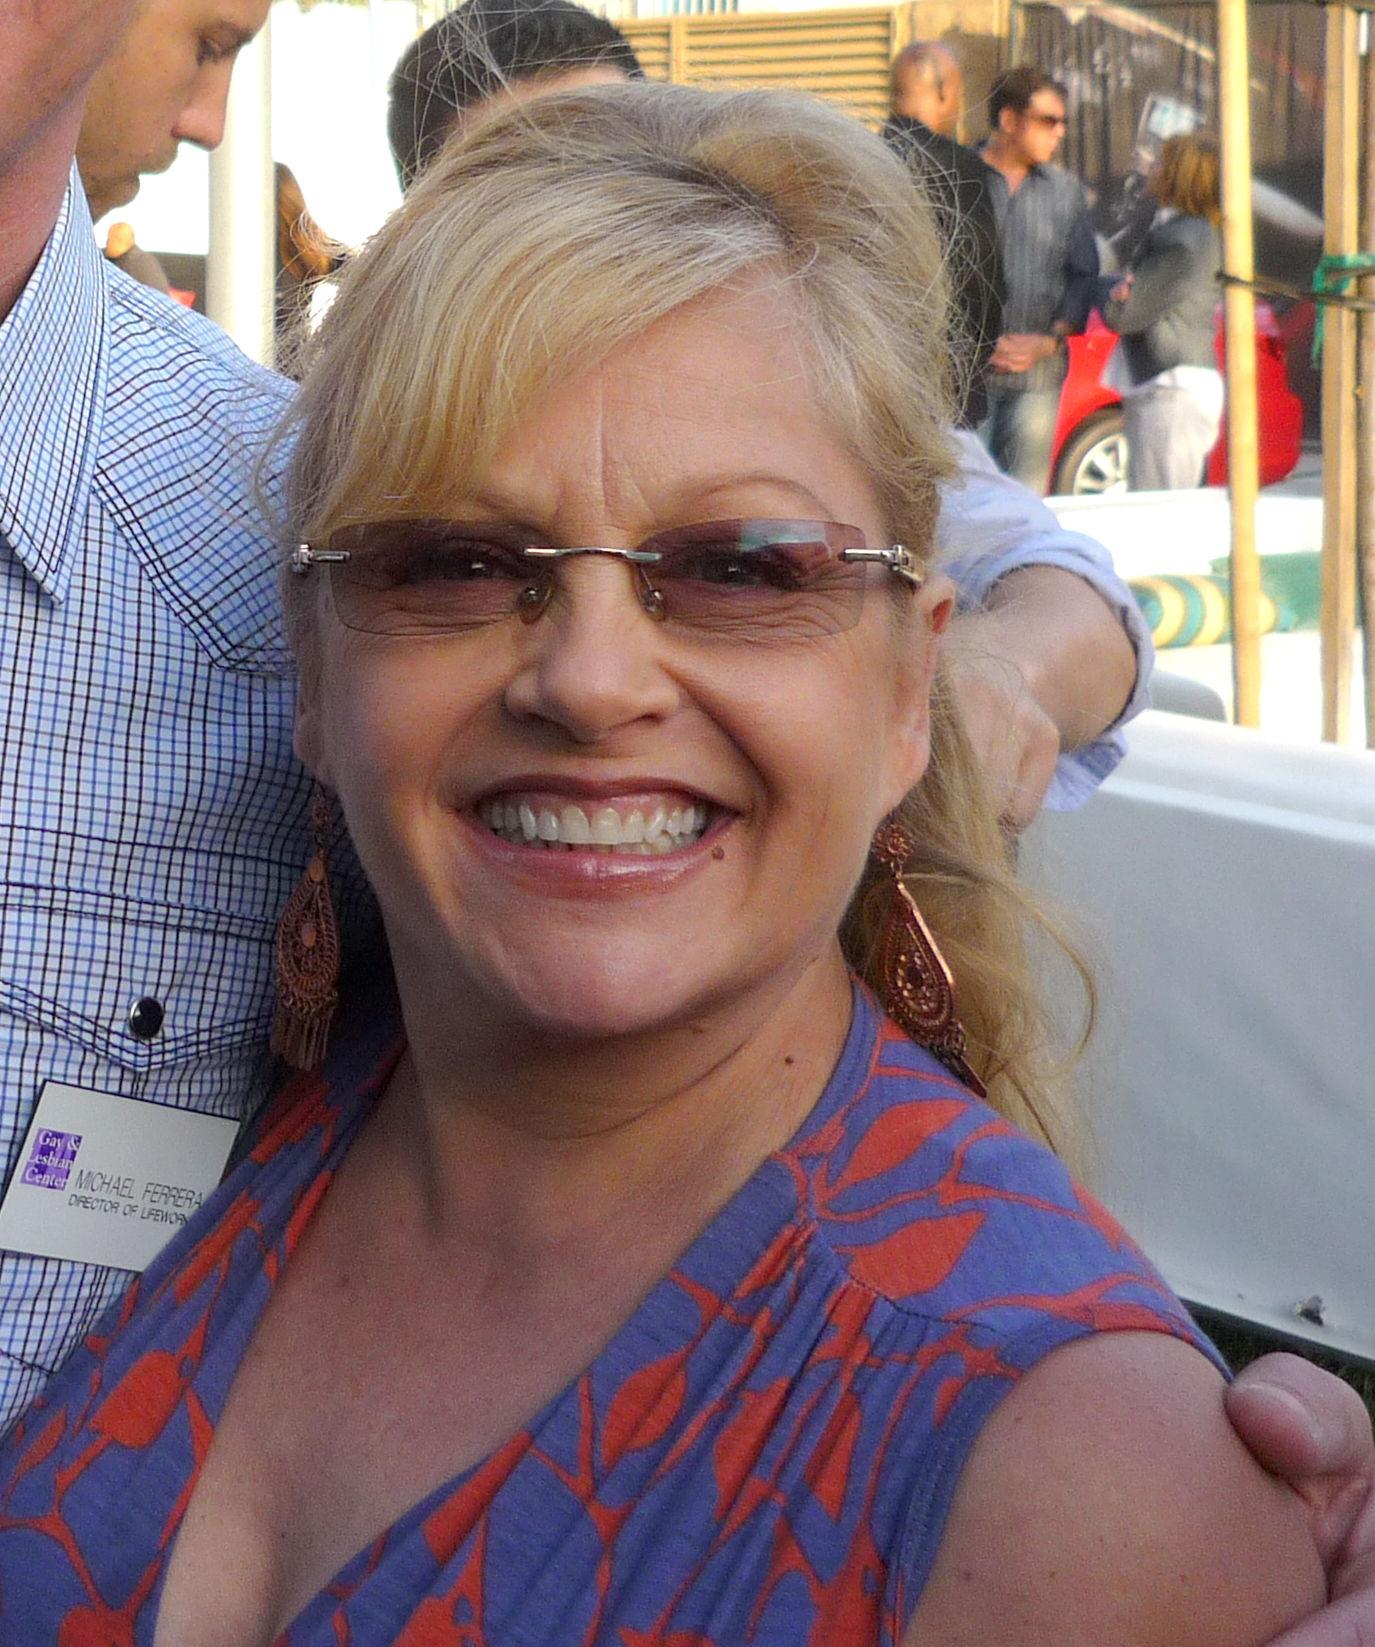 Photo of Charlene Tilton: American actress